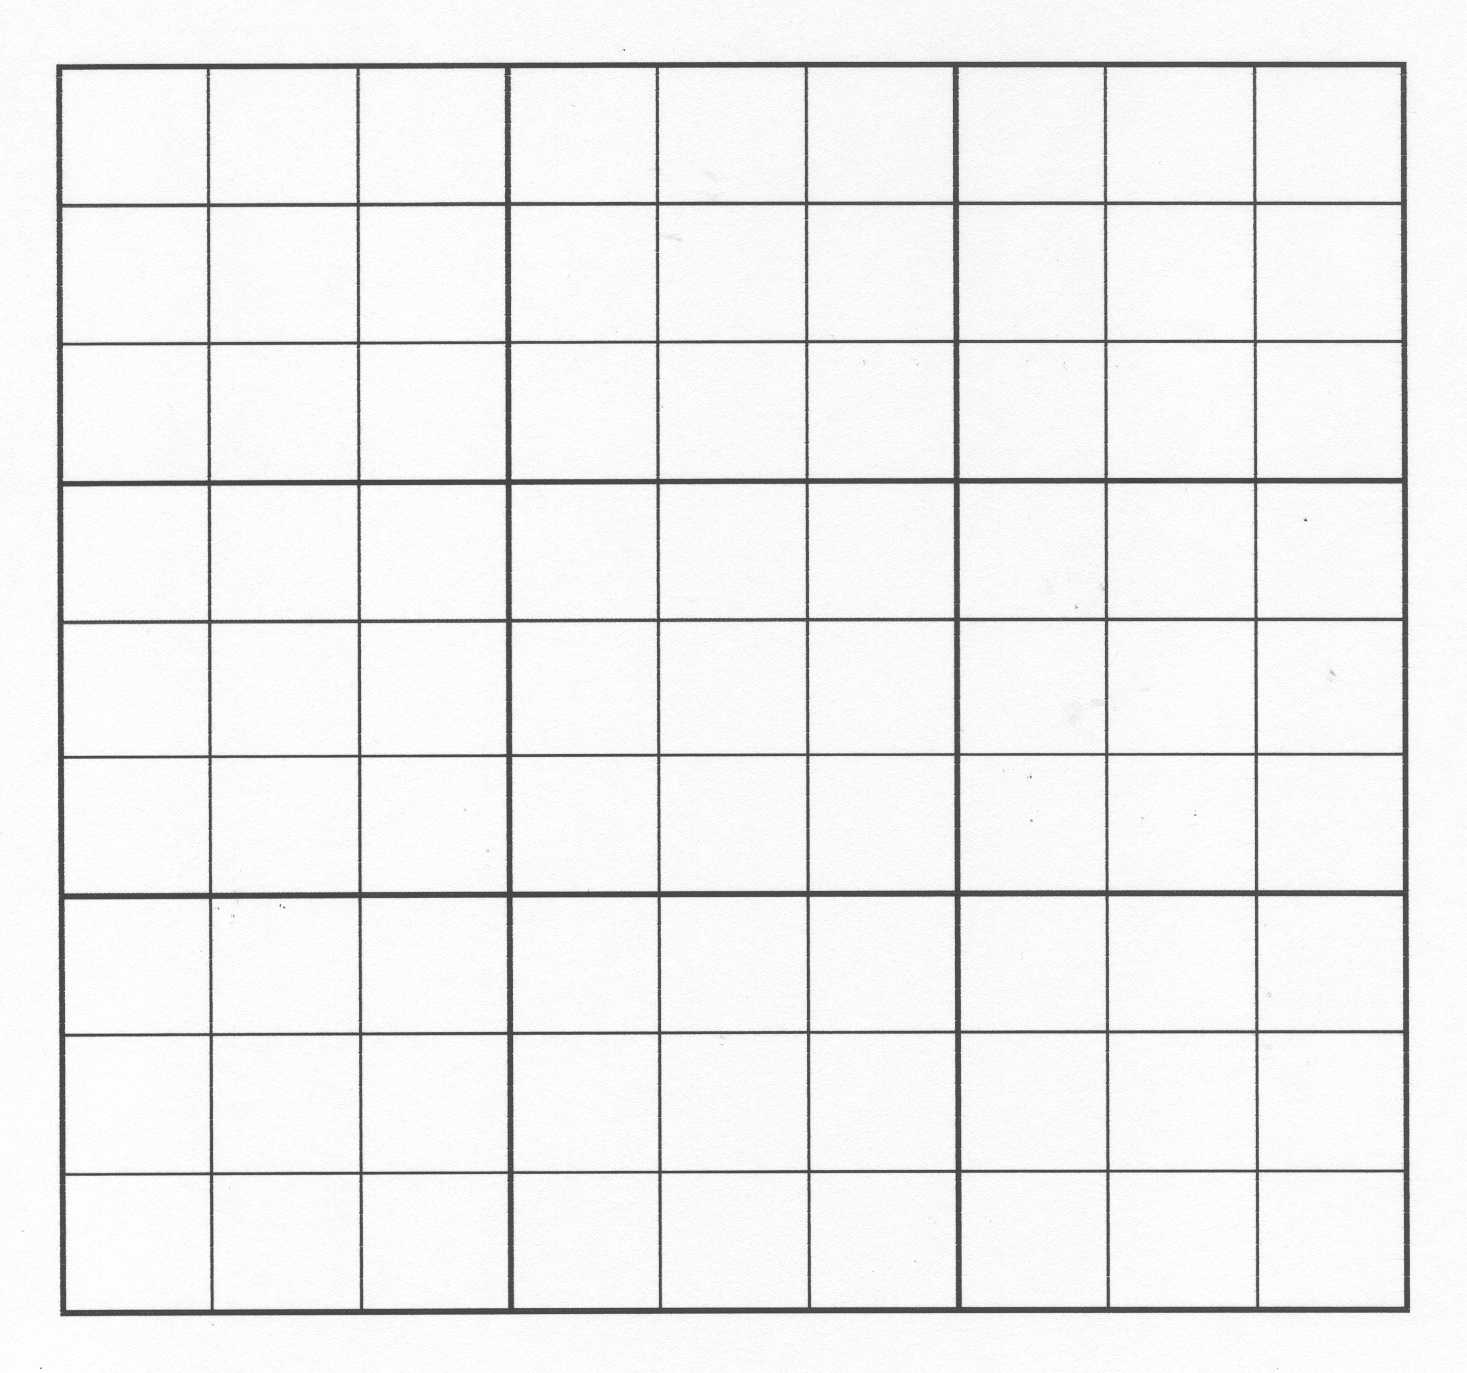 grille vierge sudoku